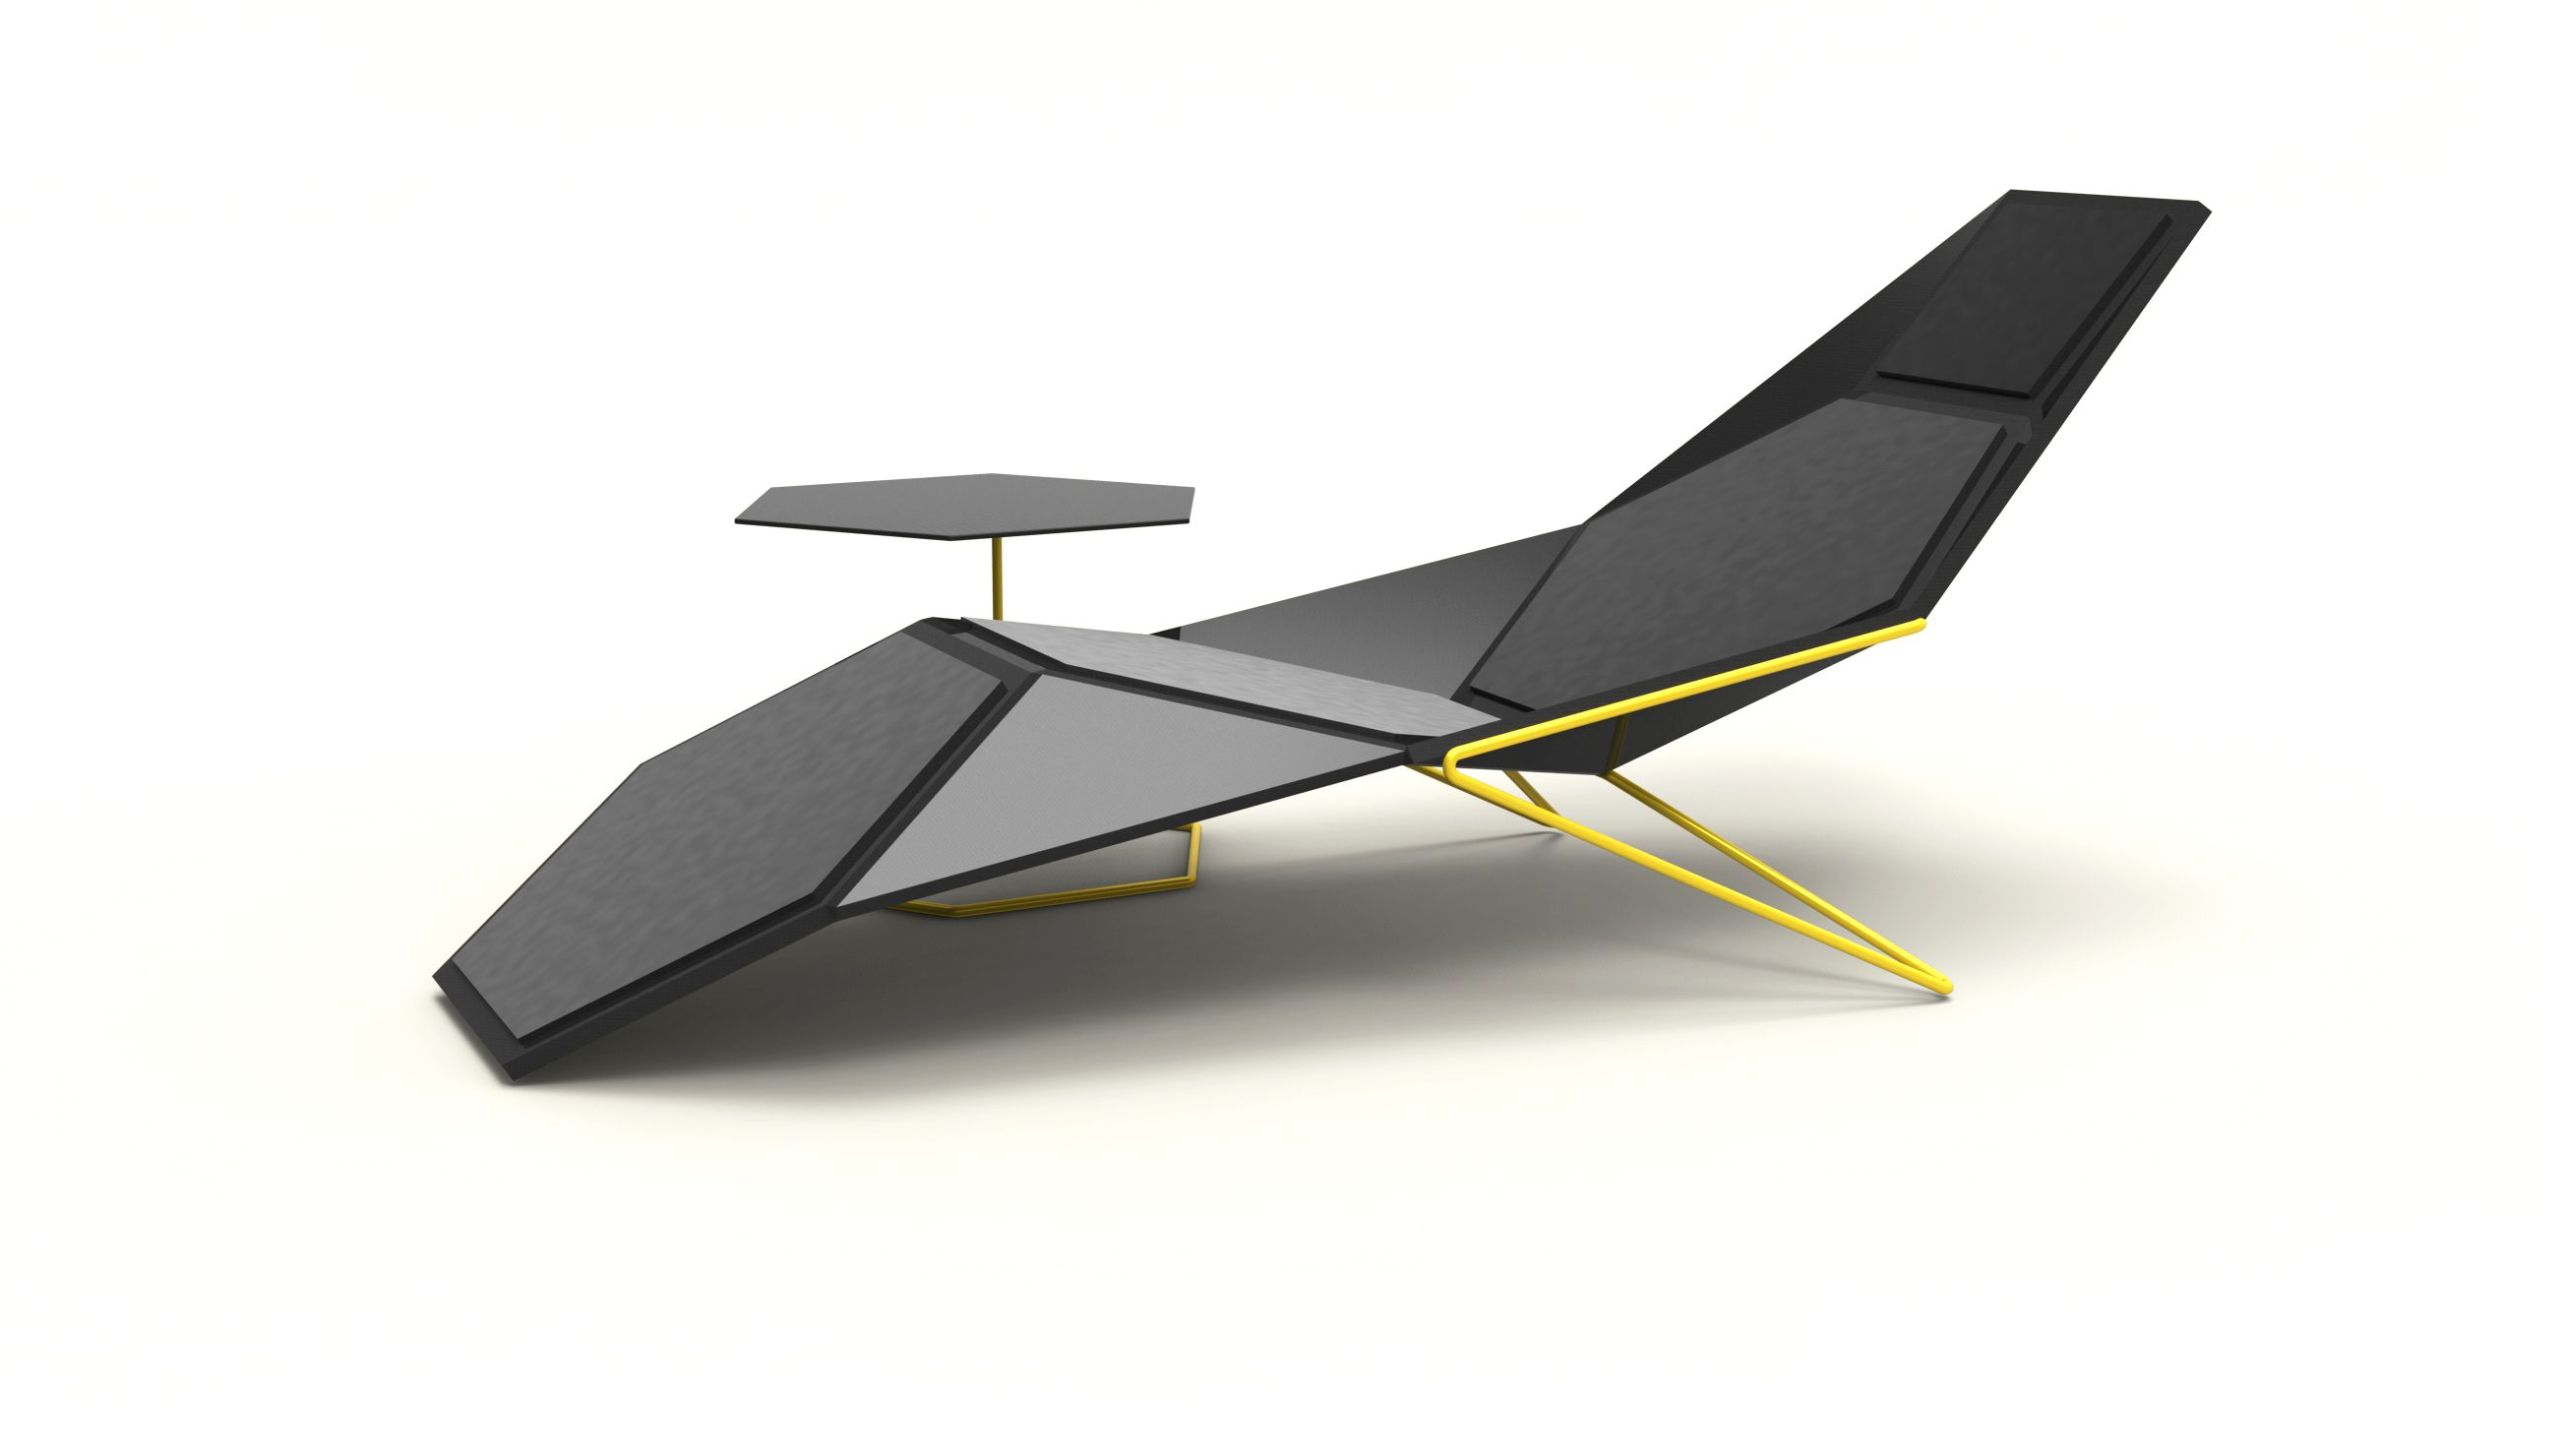 Best Futuristic Furniture Design Concept 4339 Affordable